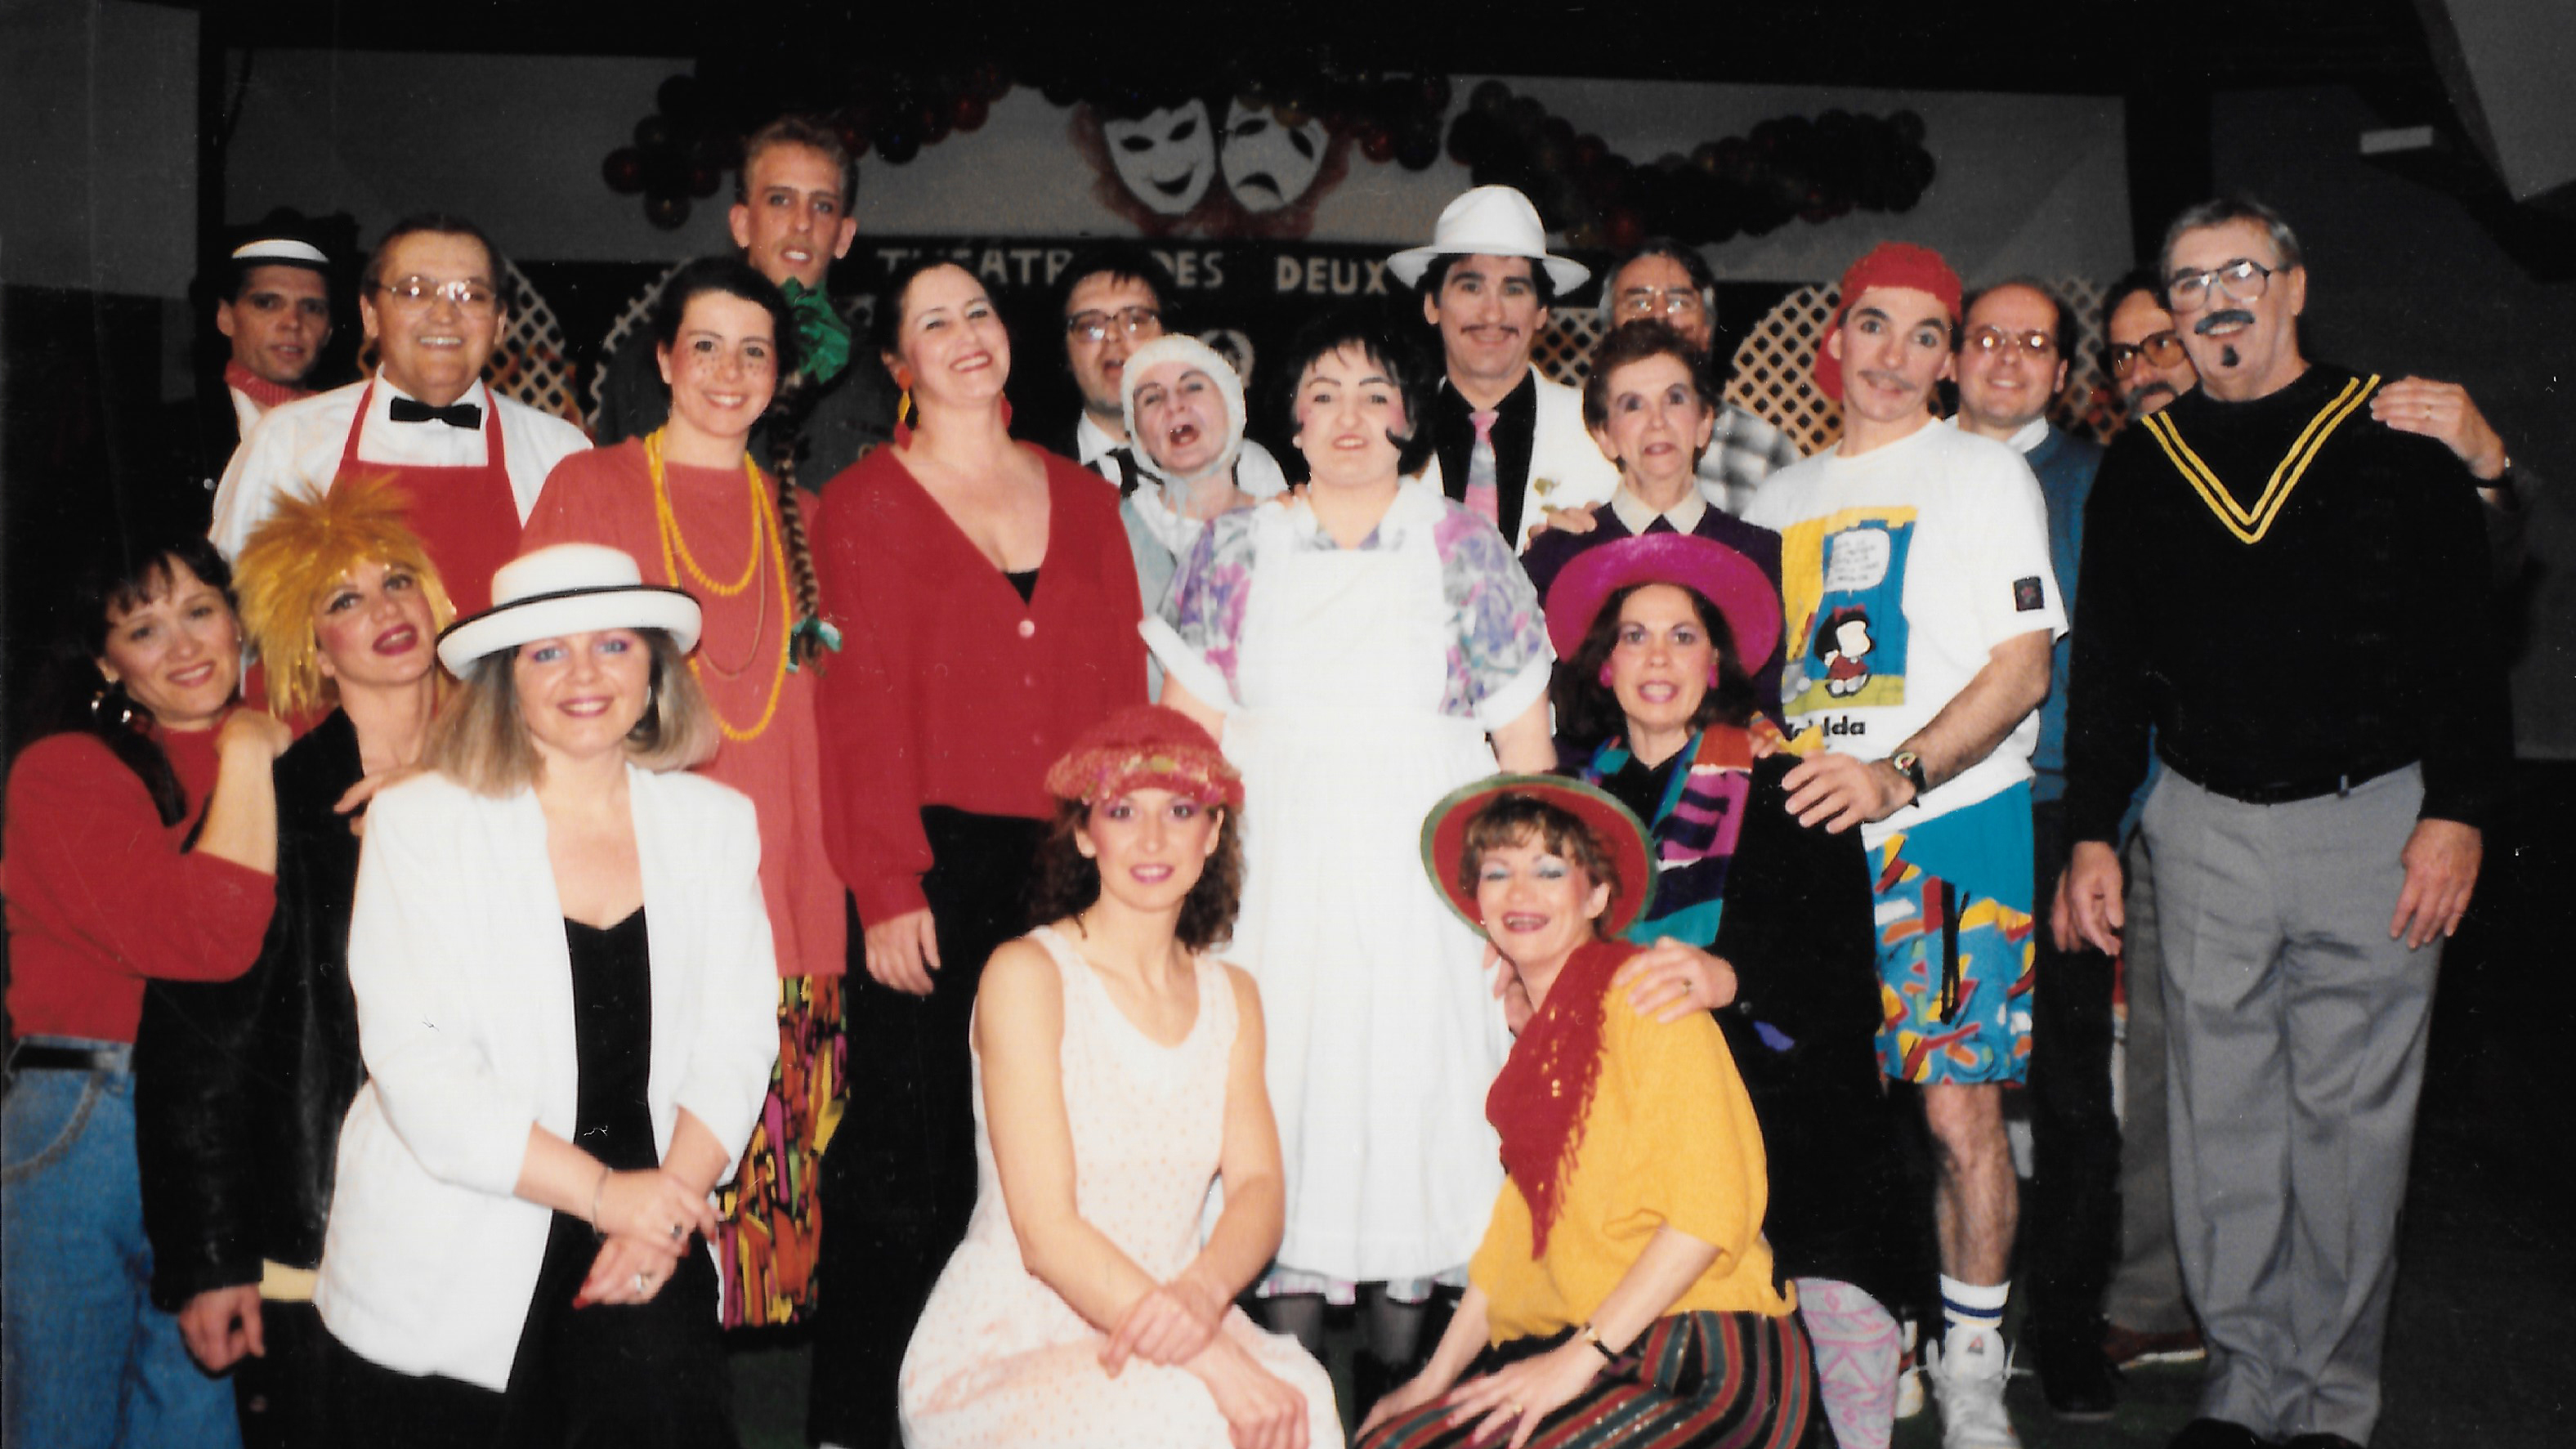 1992 L'amour sauce italienne 2CropClean